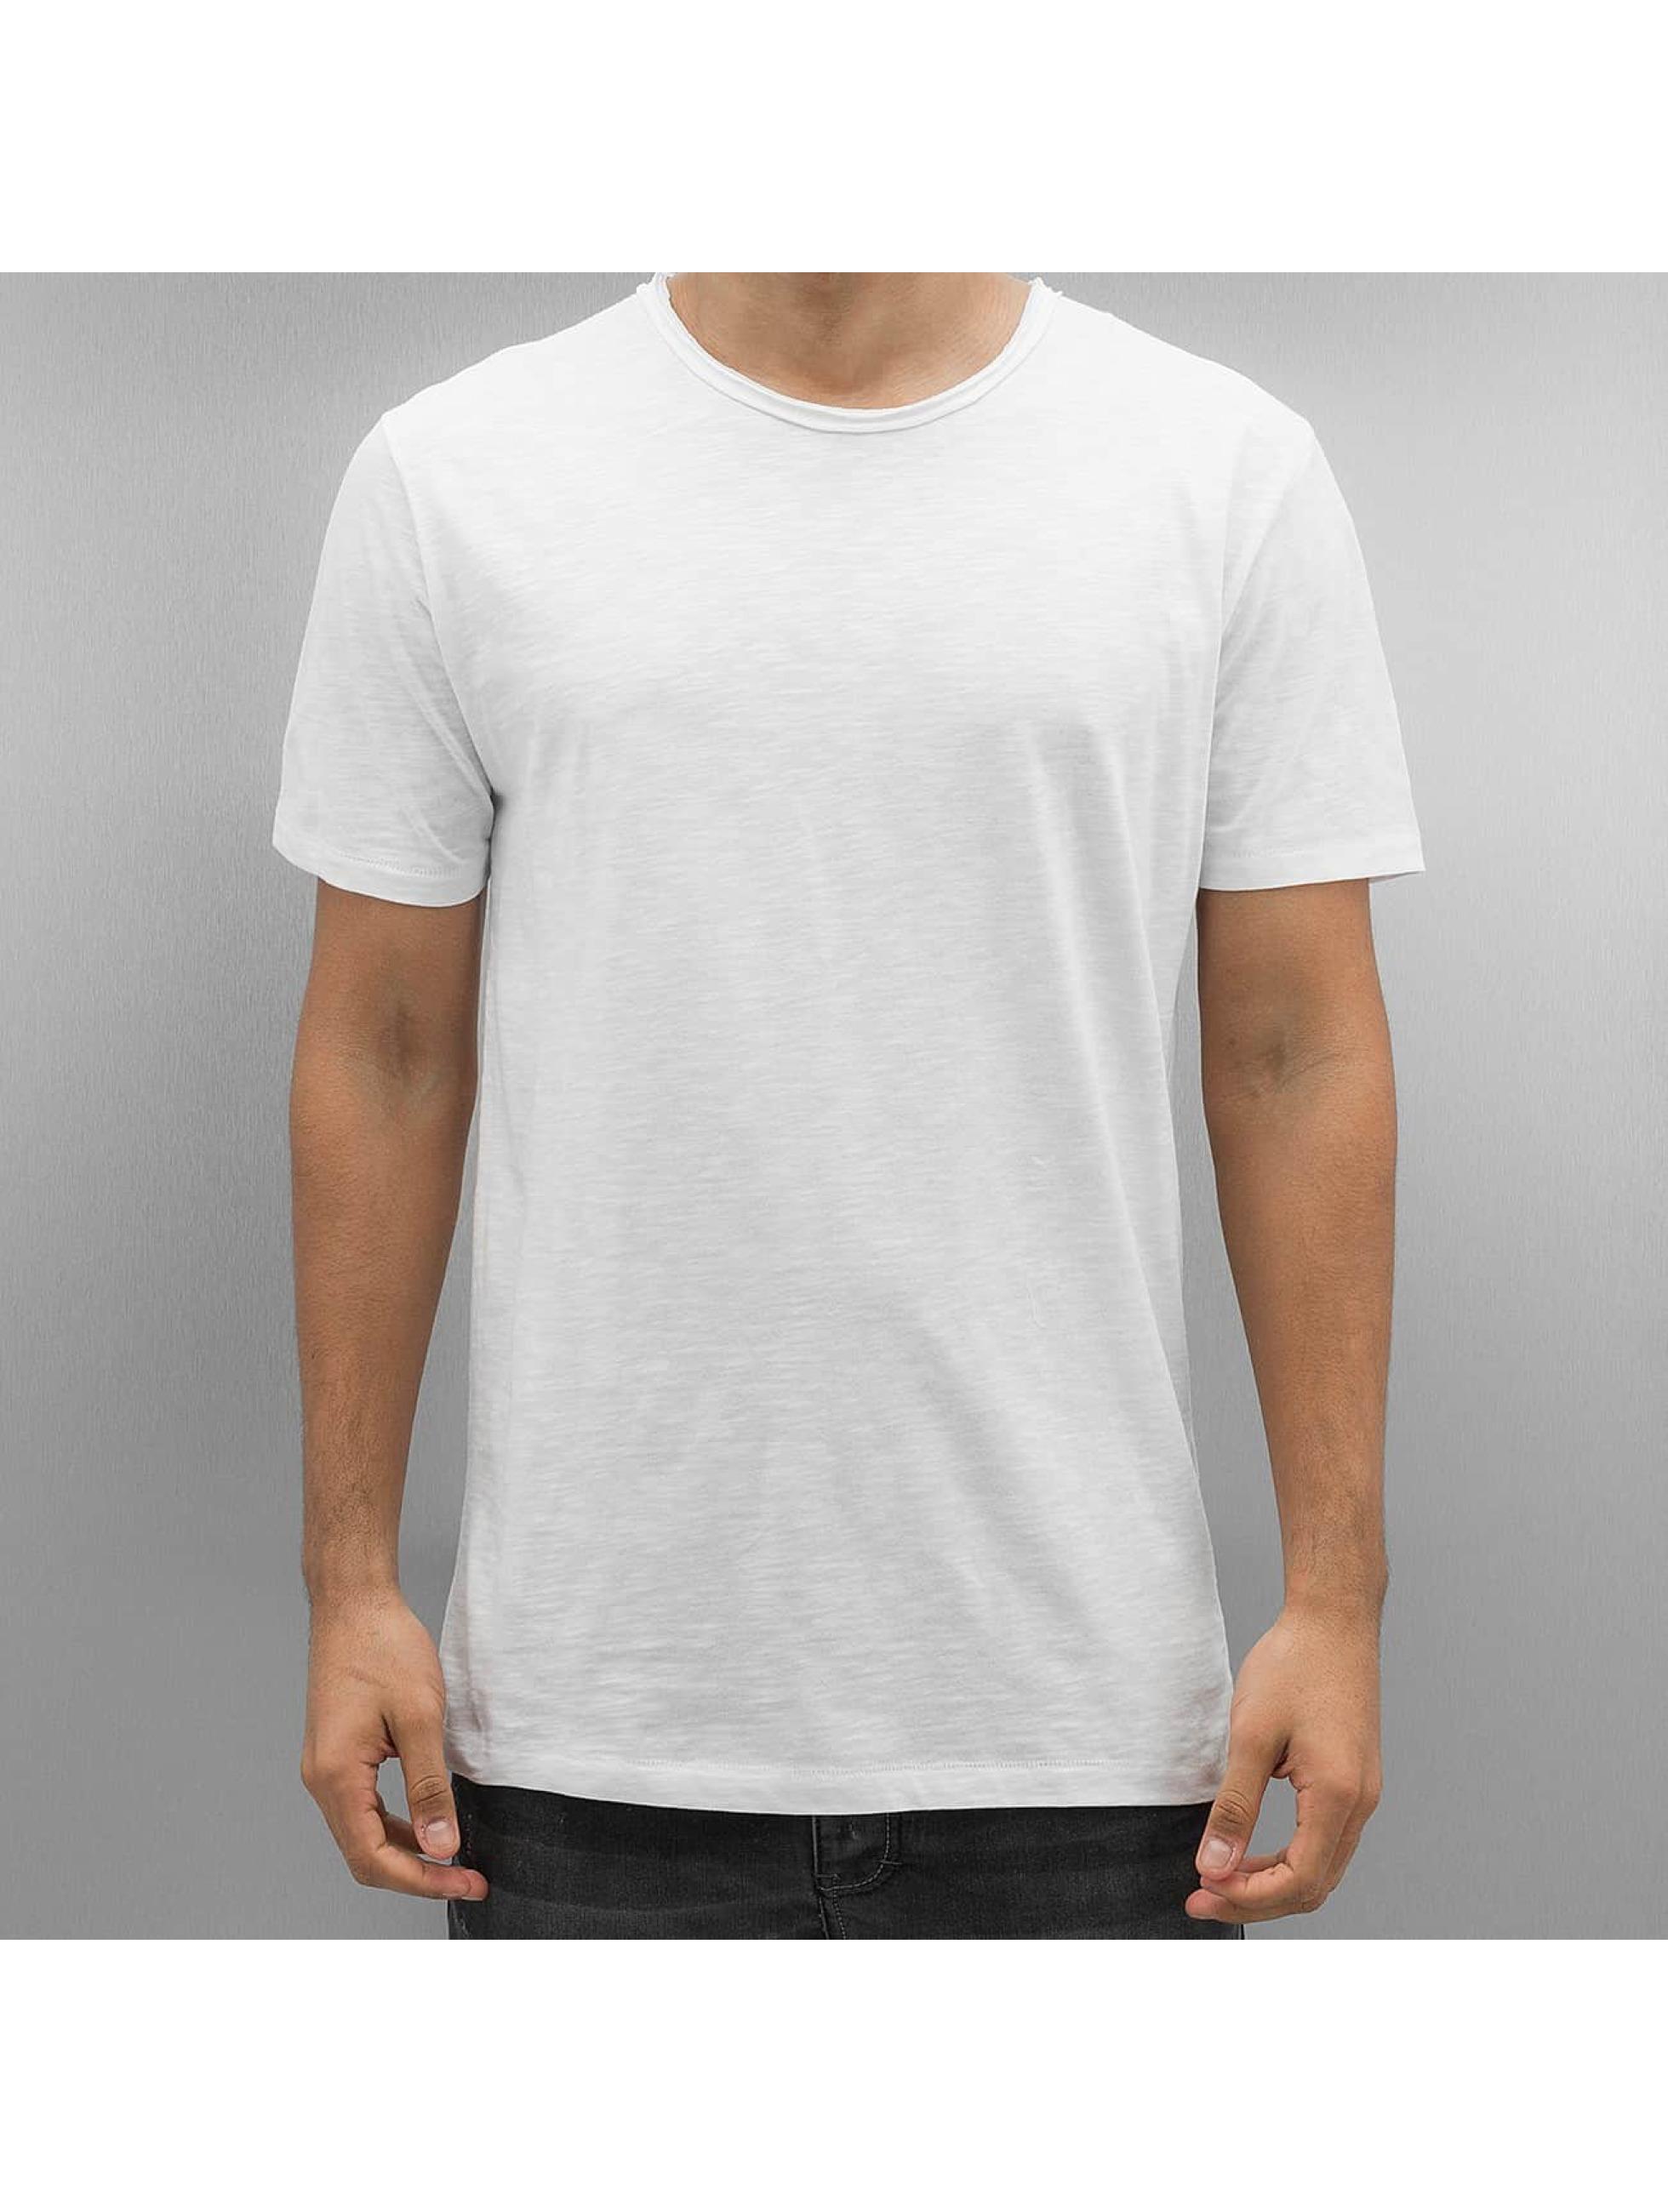 DEF T-Shirt Irvine white